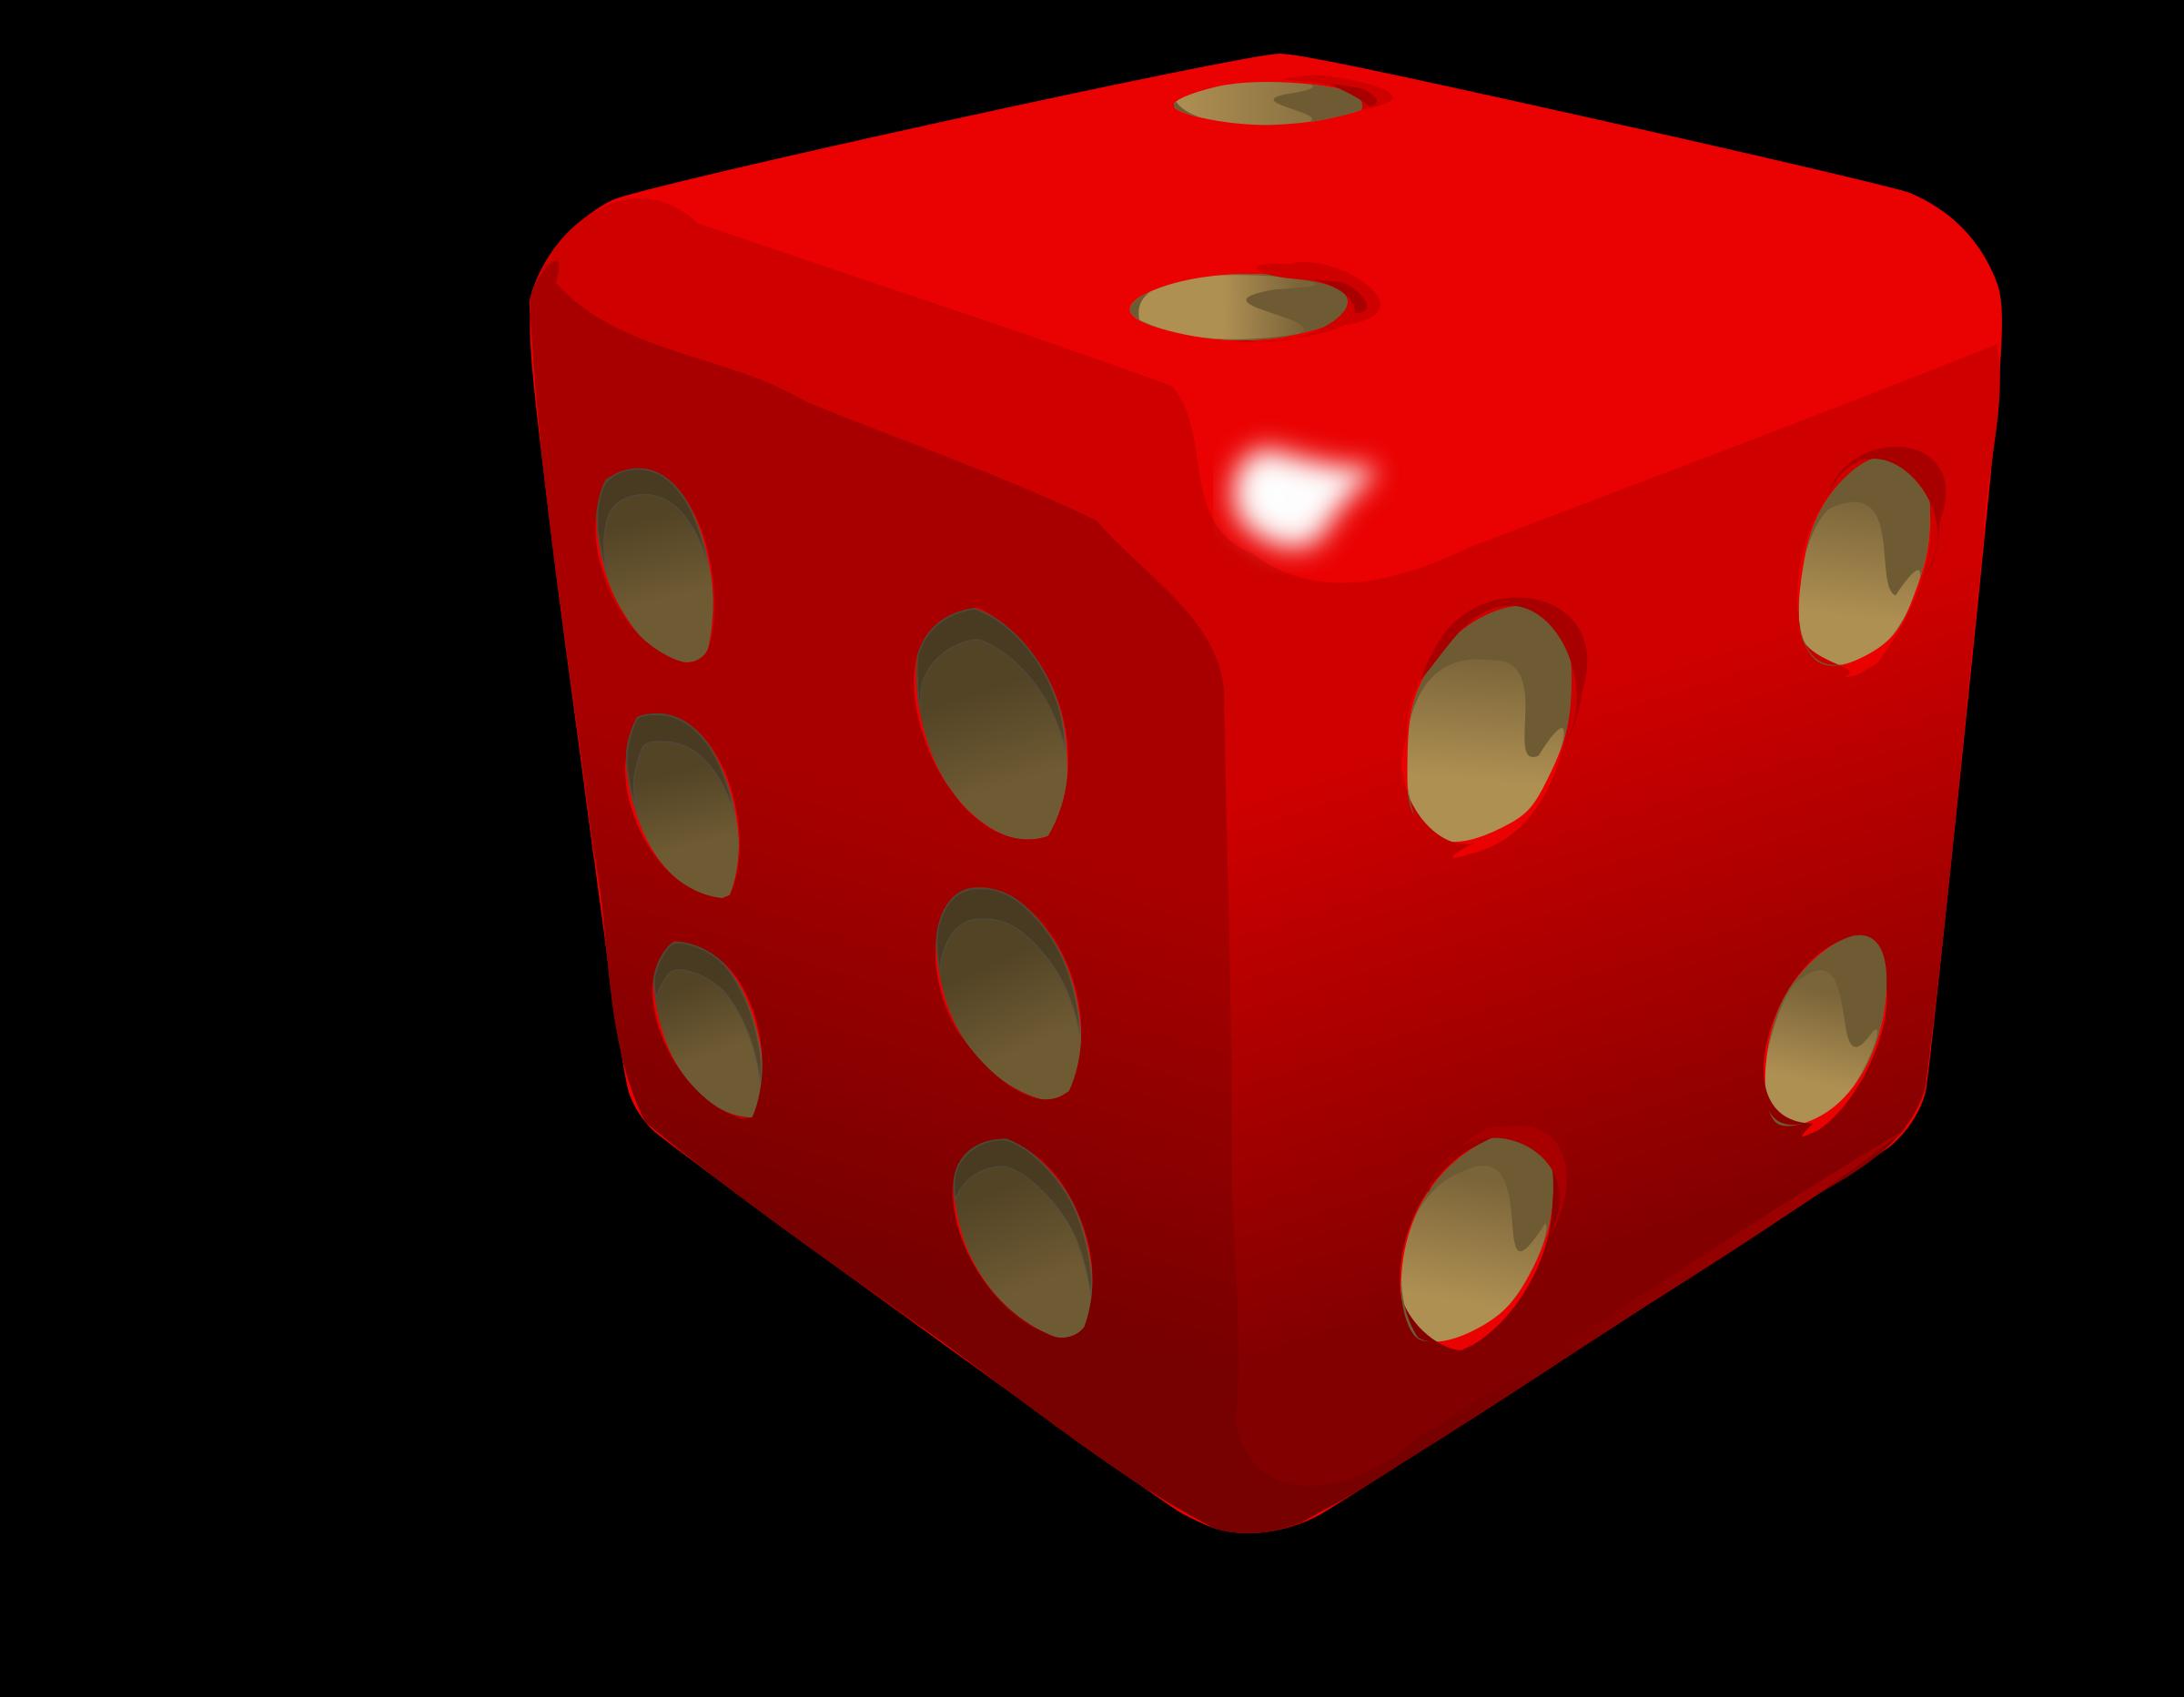 Dado big image png. Play clipart dice game